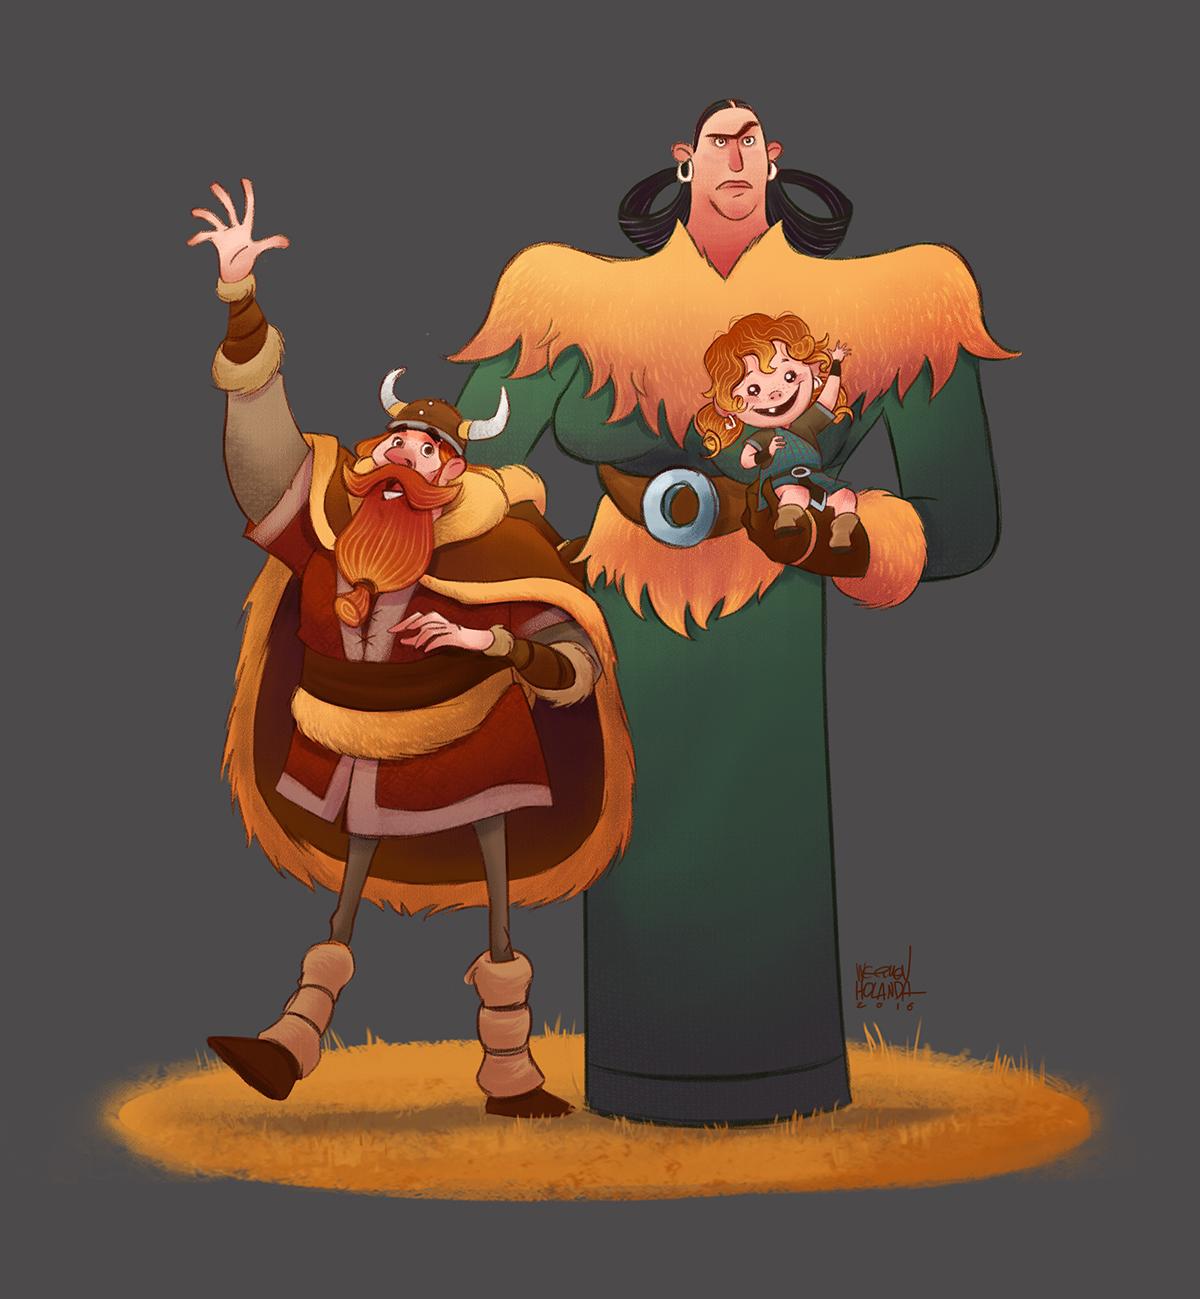 characterdesign conceptart Ilustração design personagens cartoon ChildrenIllustration